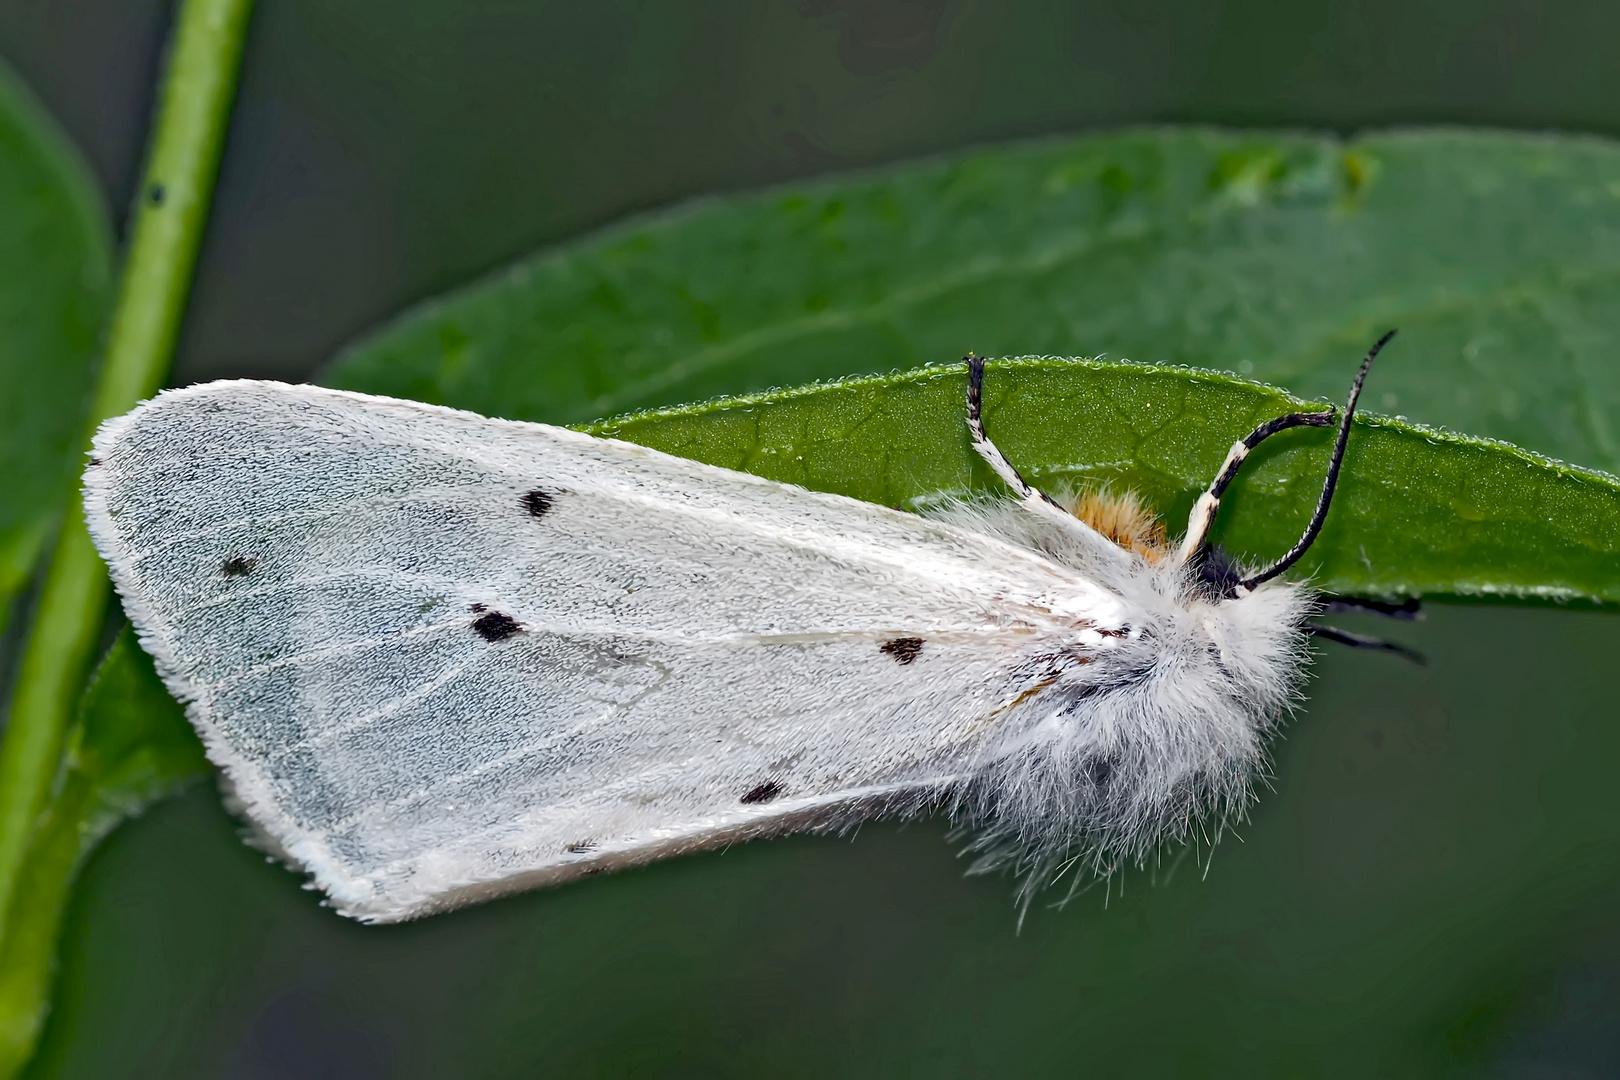 Schmalflügeliger Fleckleibbär (Spilosoma urticae) - L'Ecaille de l'Ortie.